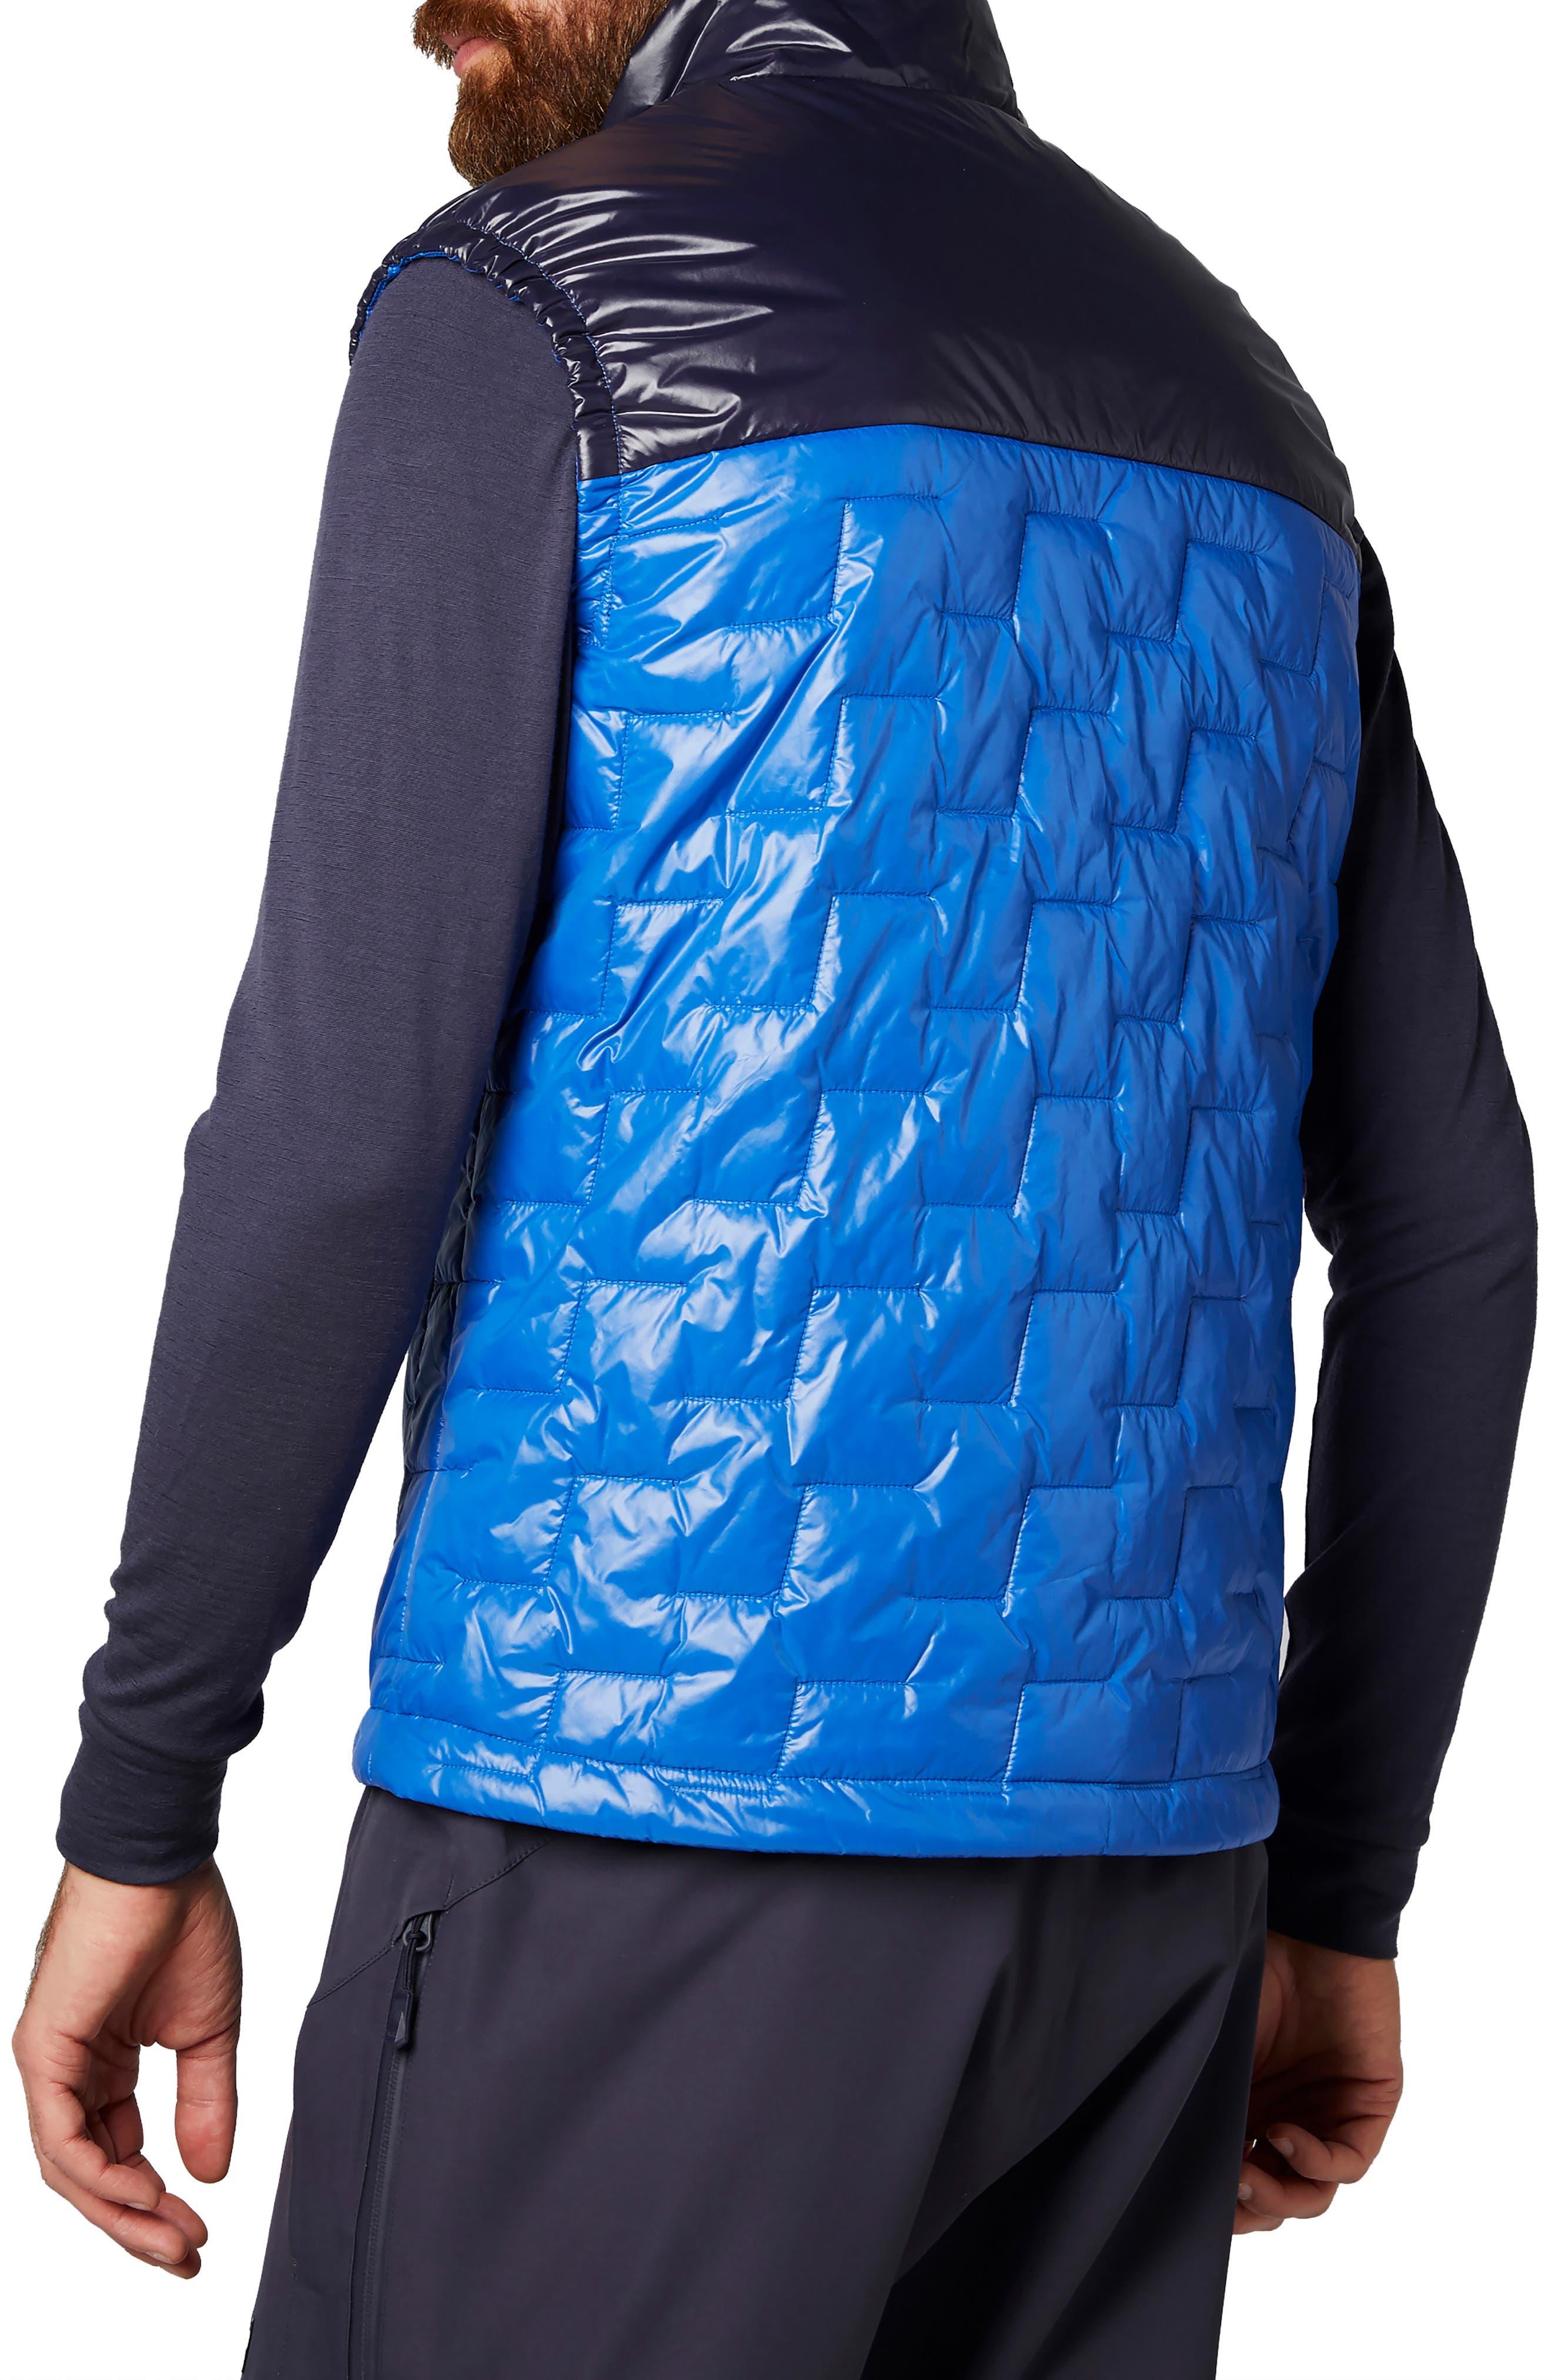 Liftaloft<sup>™</sup> Hybrid Water- & Wind-Resistant Insulator Vest,                             Alternate thumbnail 2, color,                             OLYMPIAN BLUE